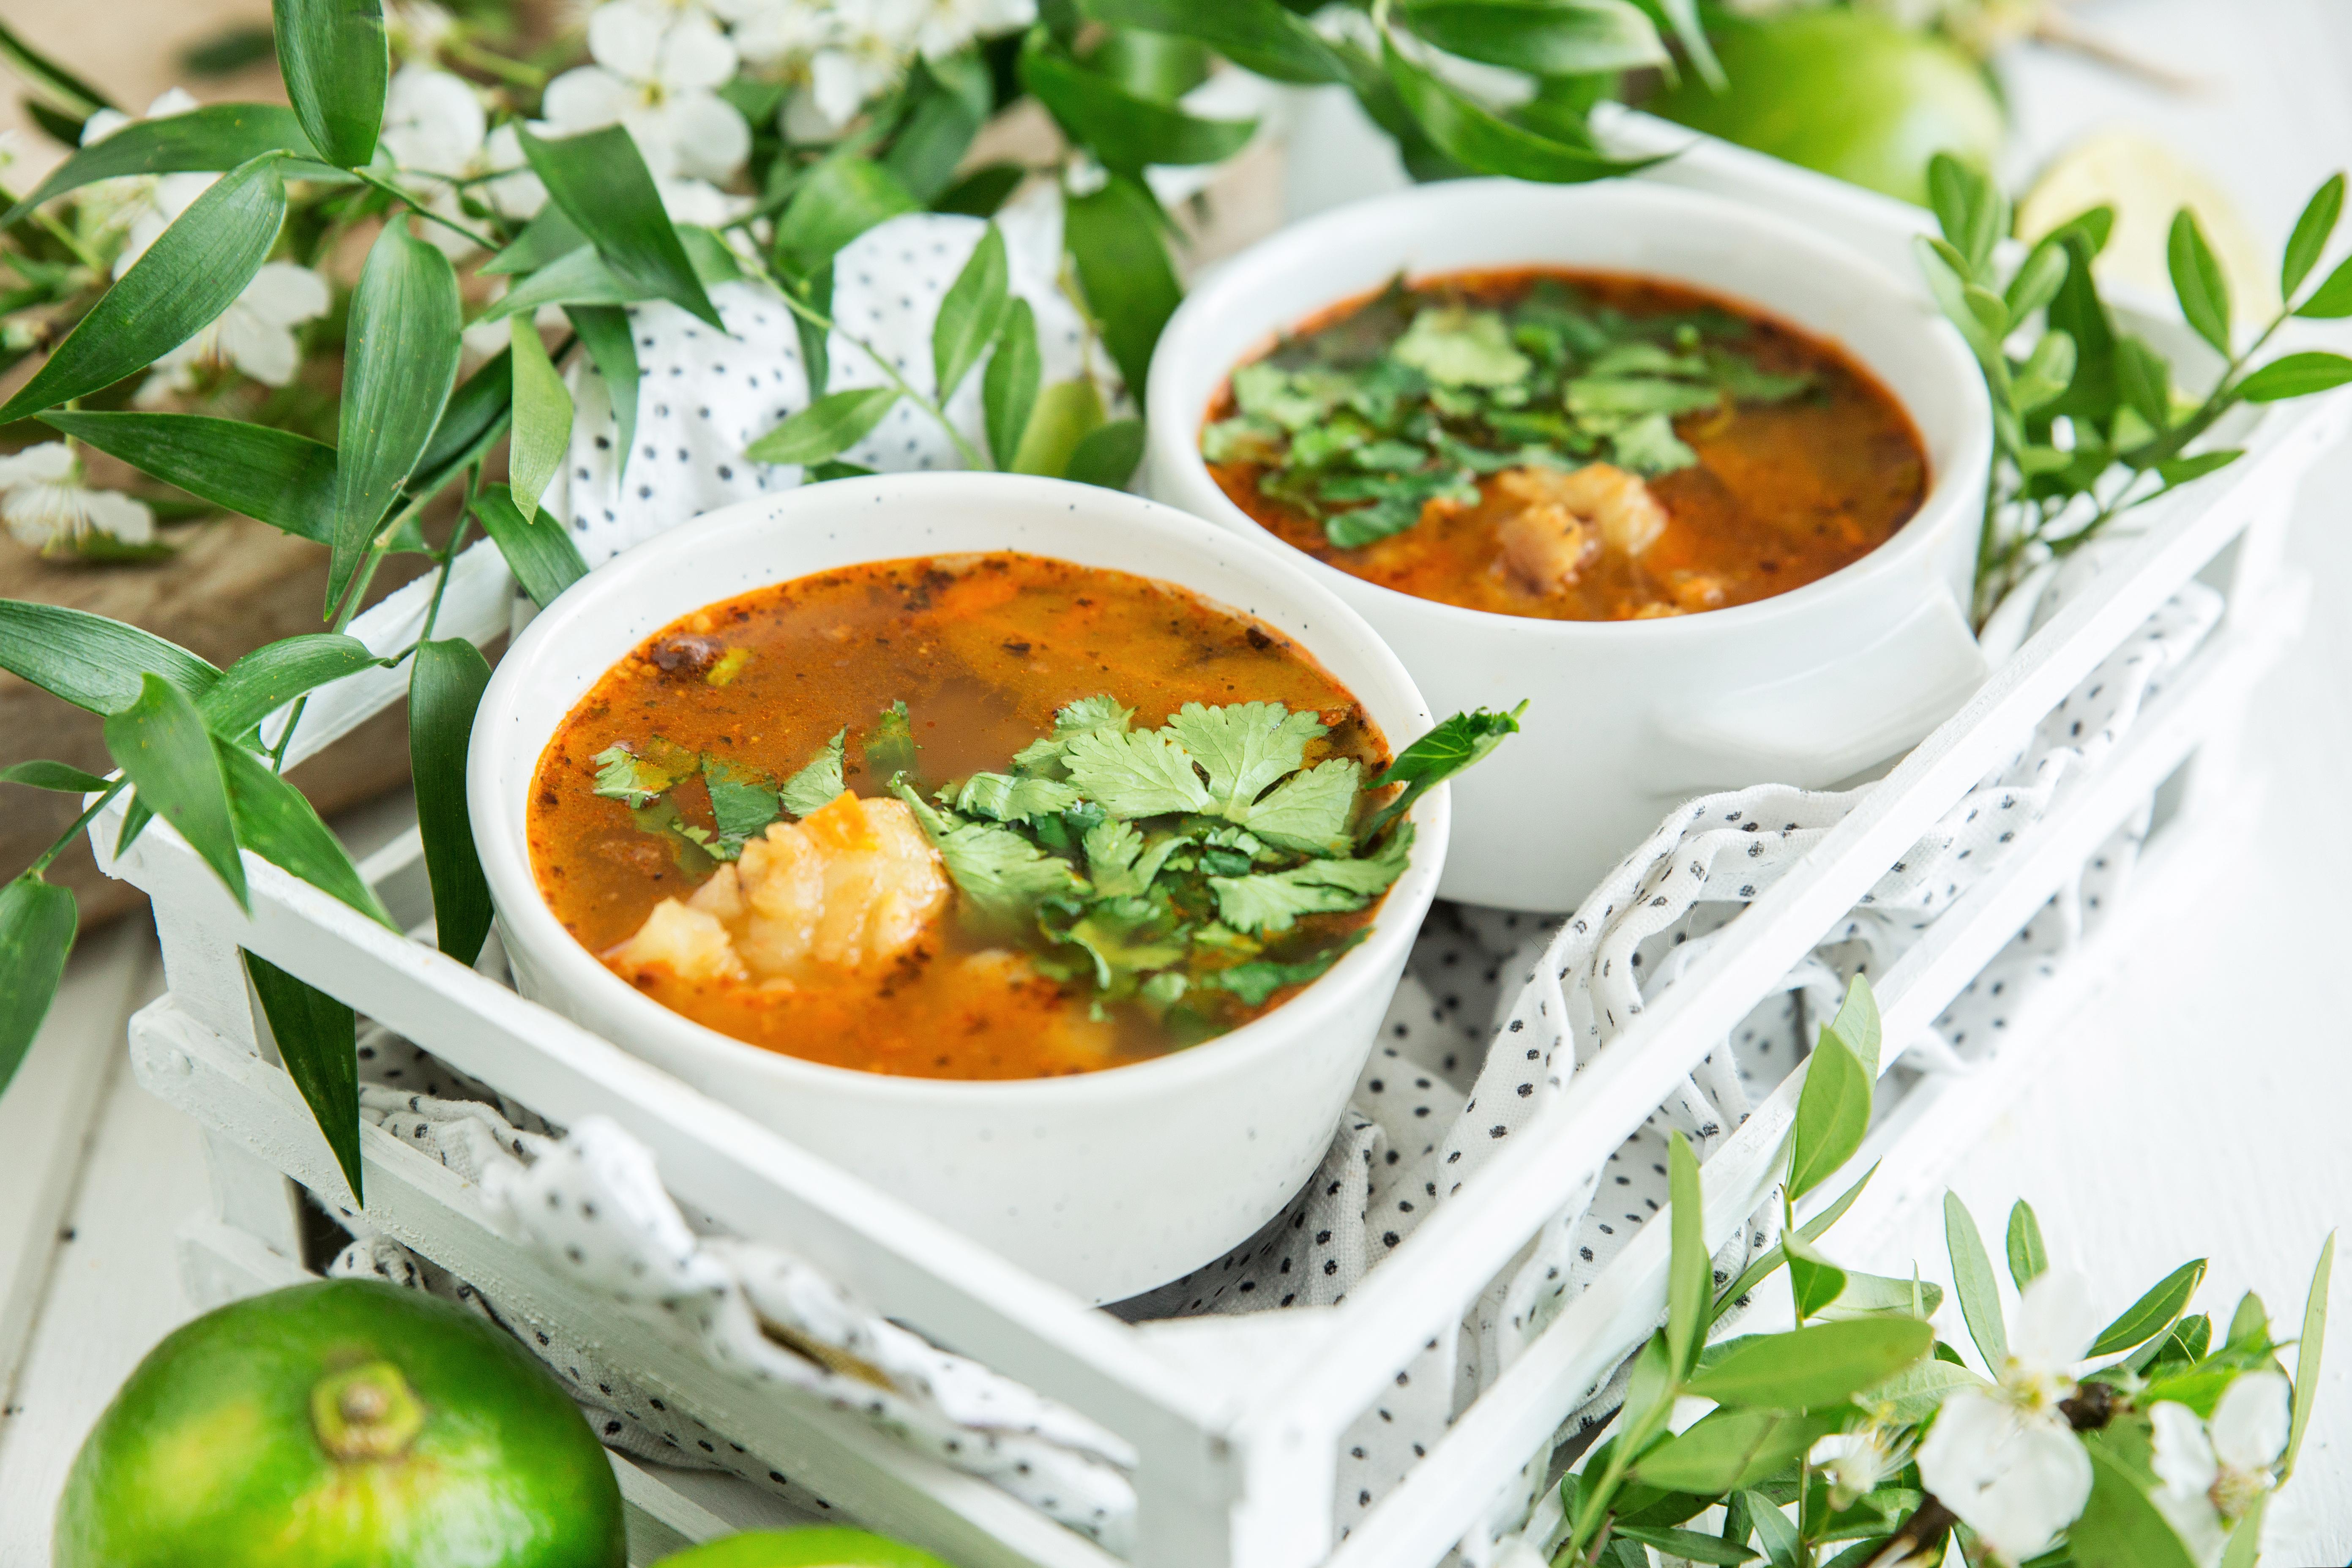 zupa rybna z chrzanem i kolendra poziom